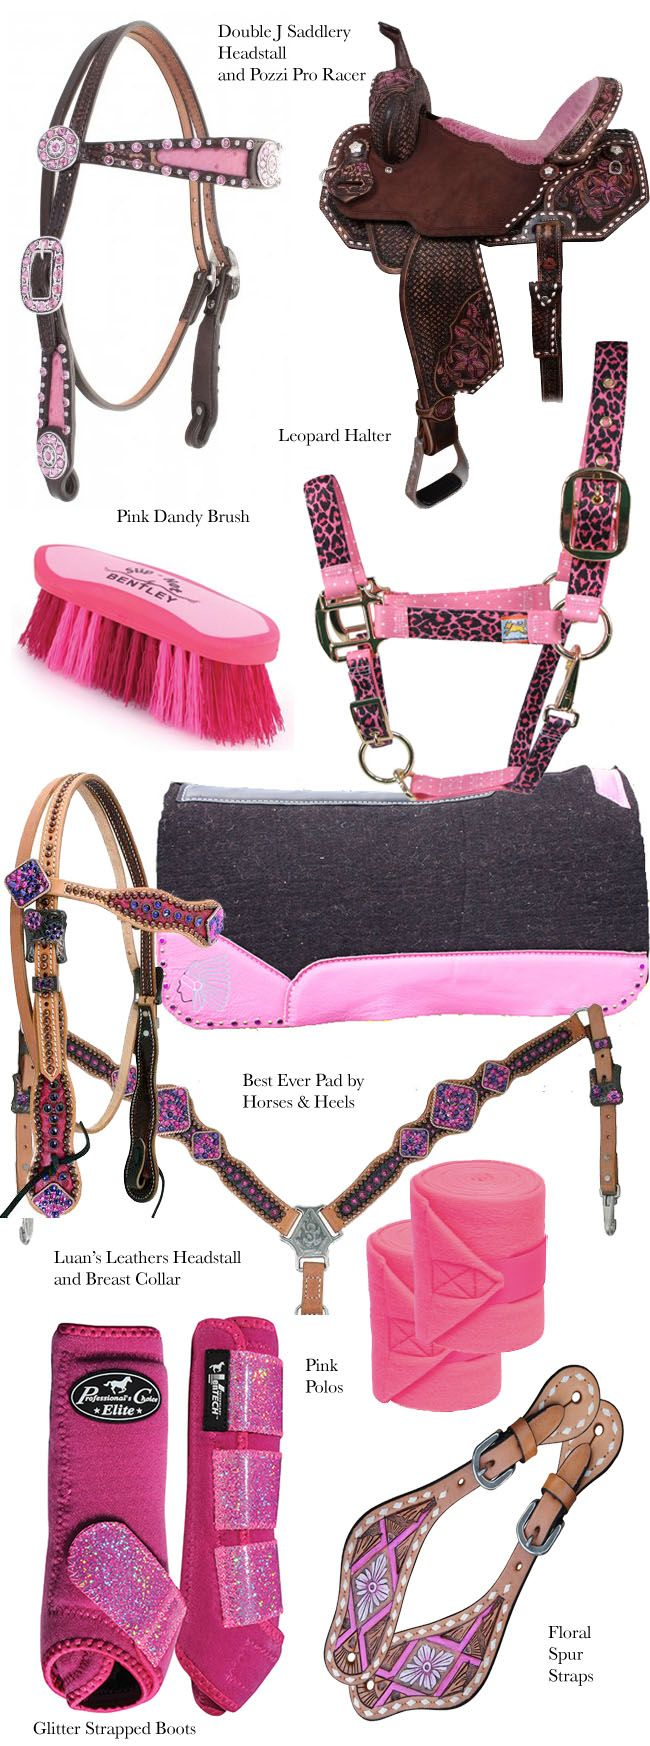 Pink Tack for the Barrel Racer | Horses & Heels